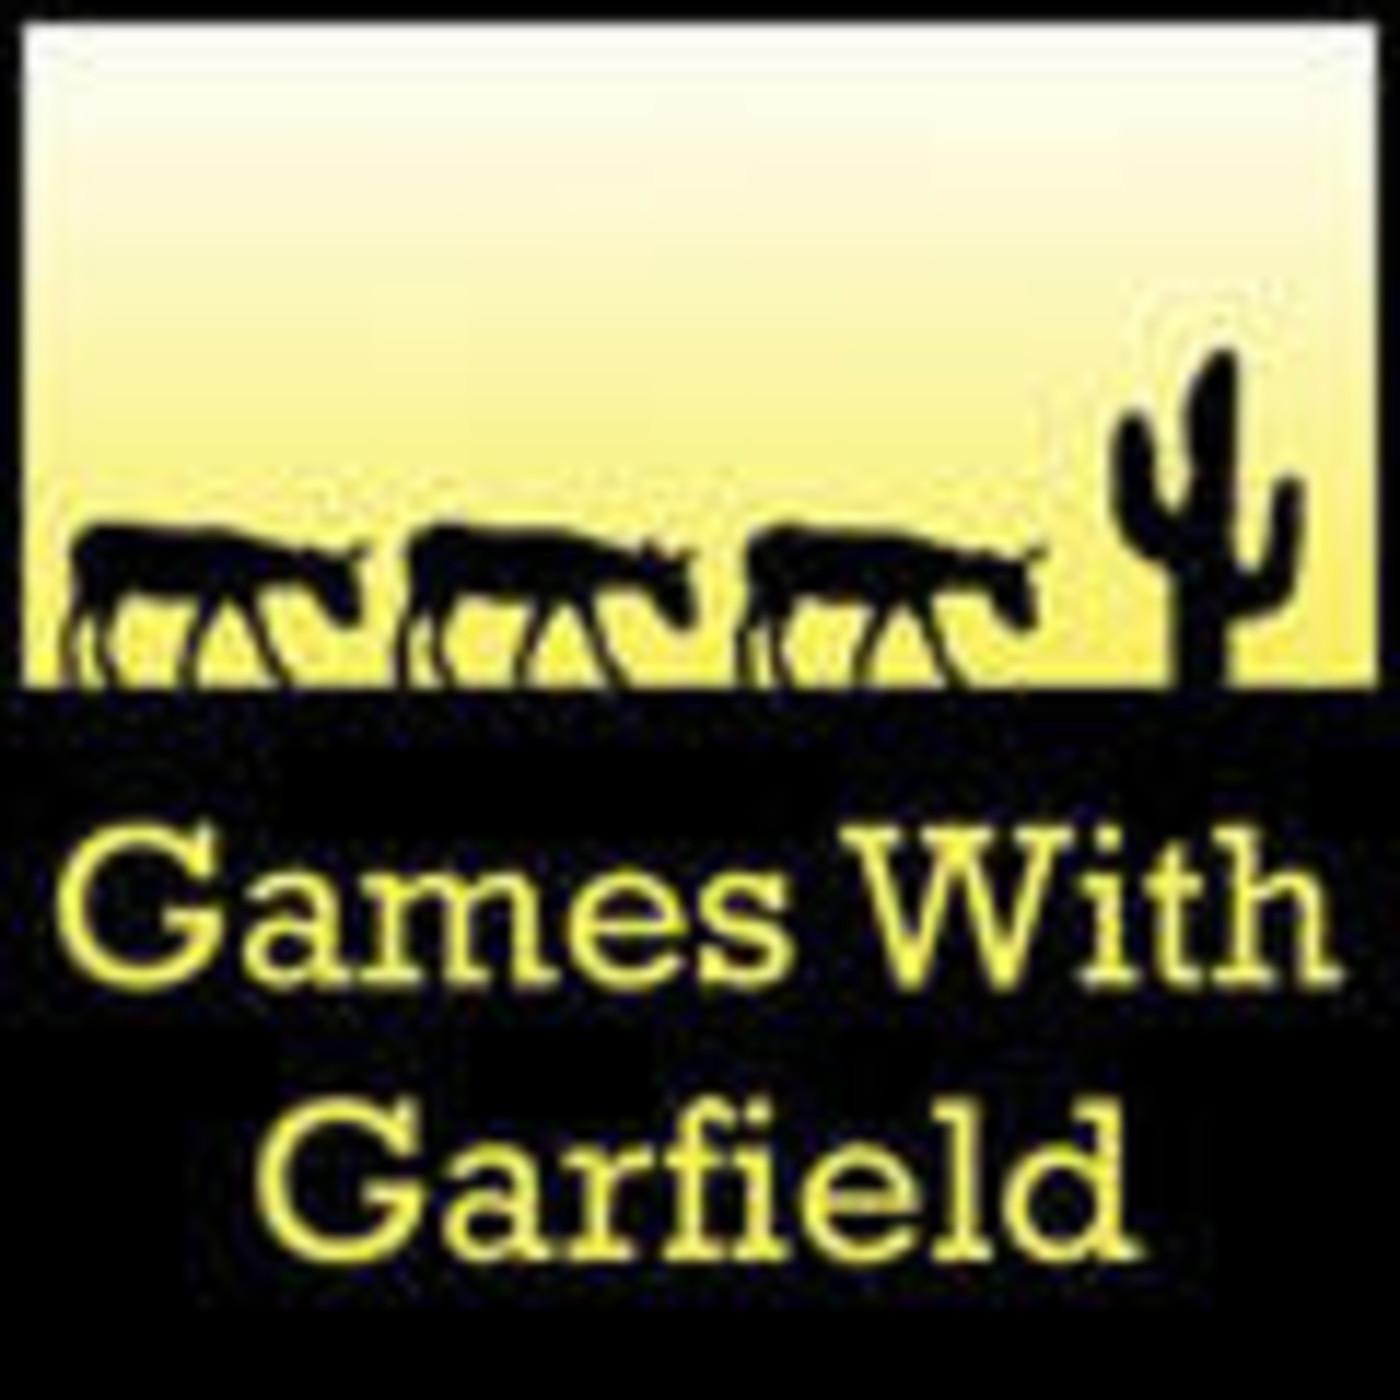 Richard Garfield/Three Donkeys